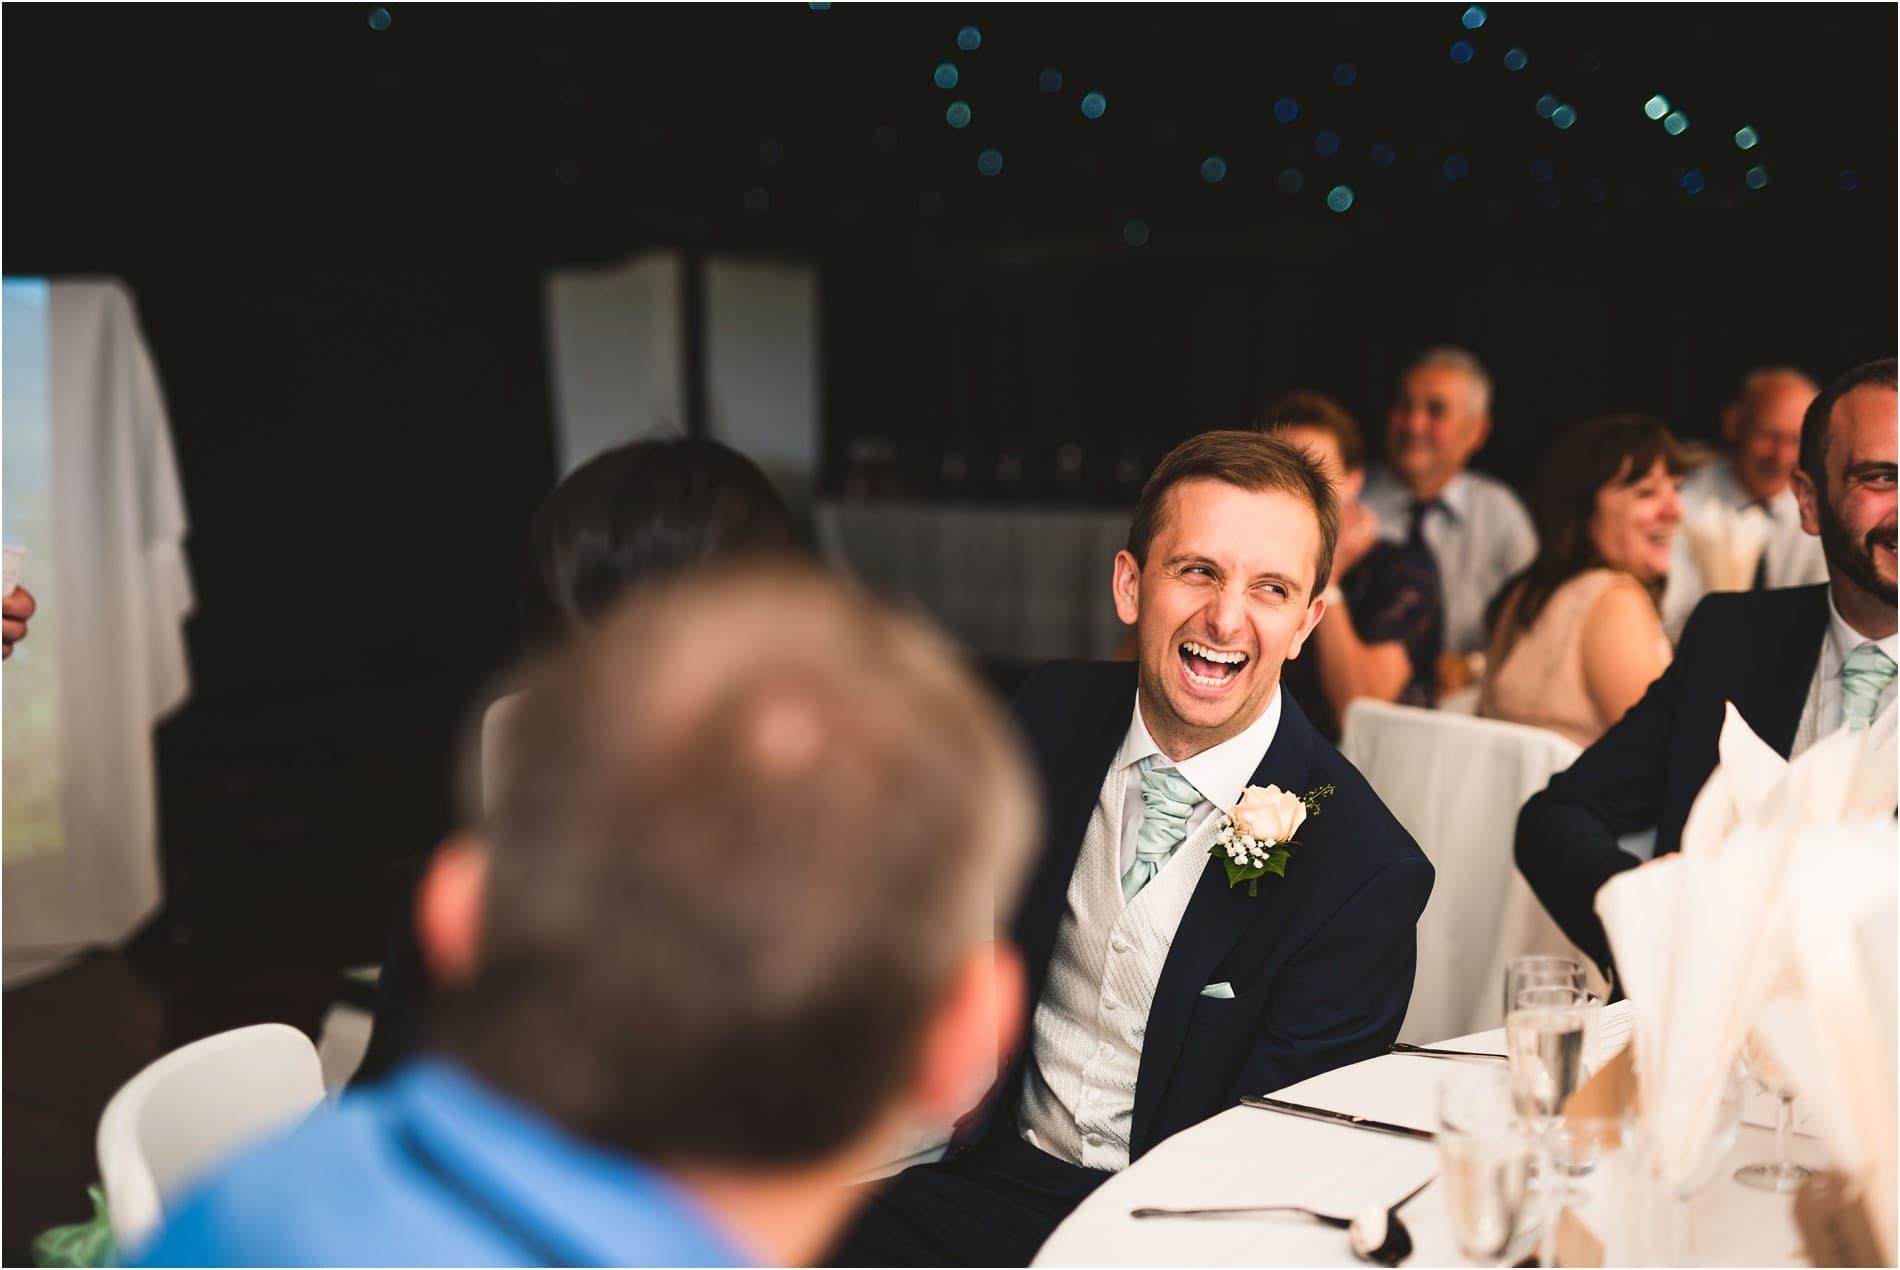 WEDDING PHOTOGRAPHERWEDDING PHOTOGRAPHER